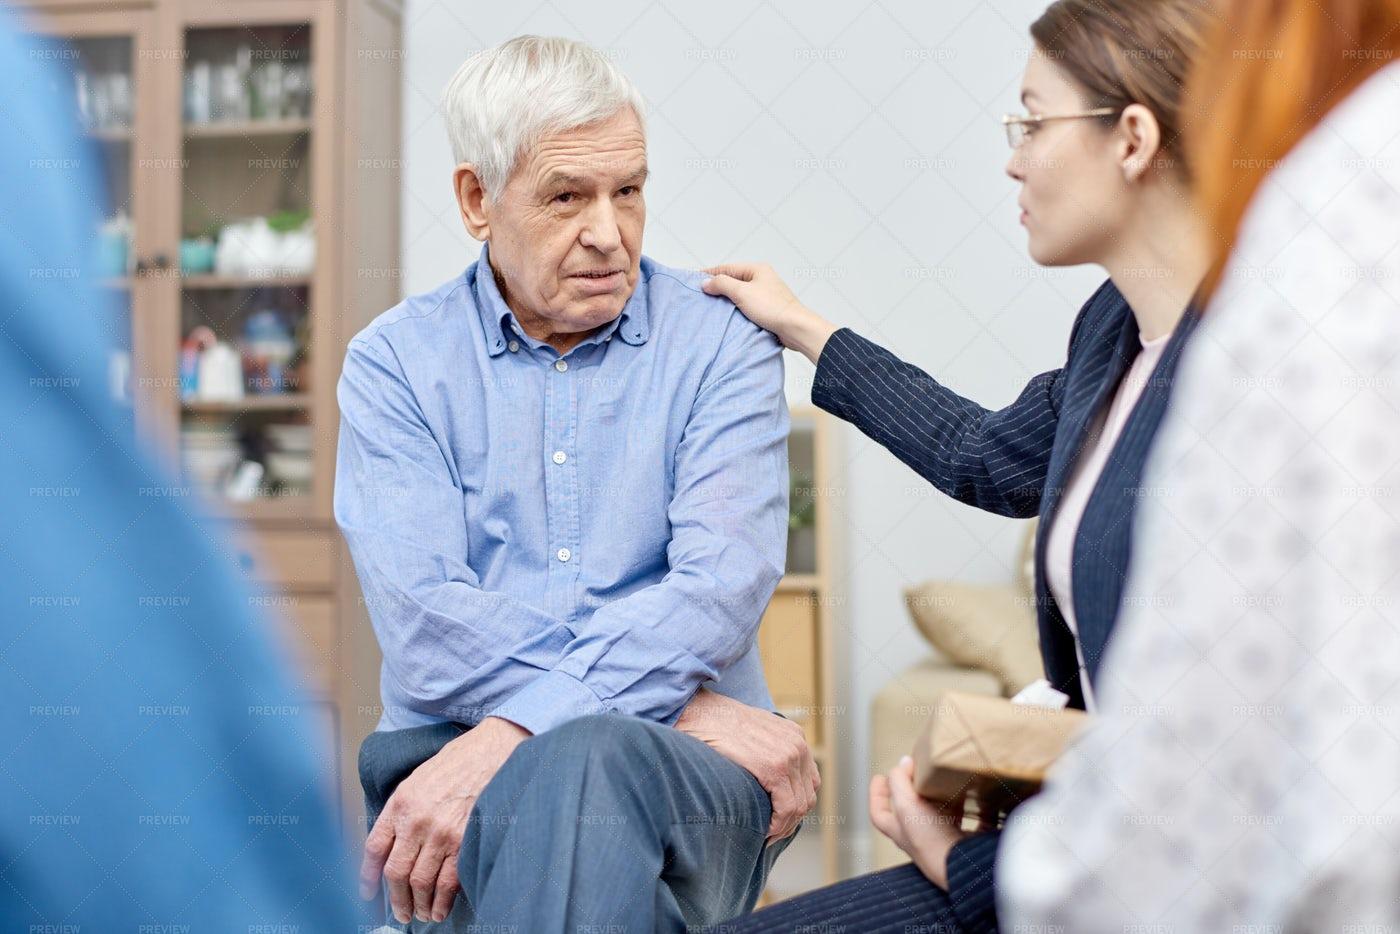 Comforting Senior Patient: Stock Photos